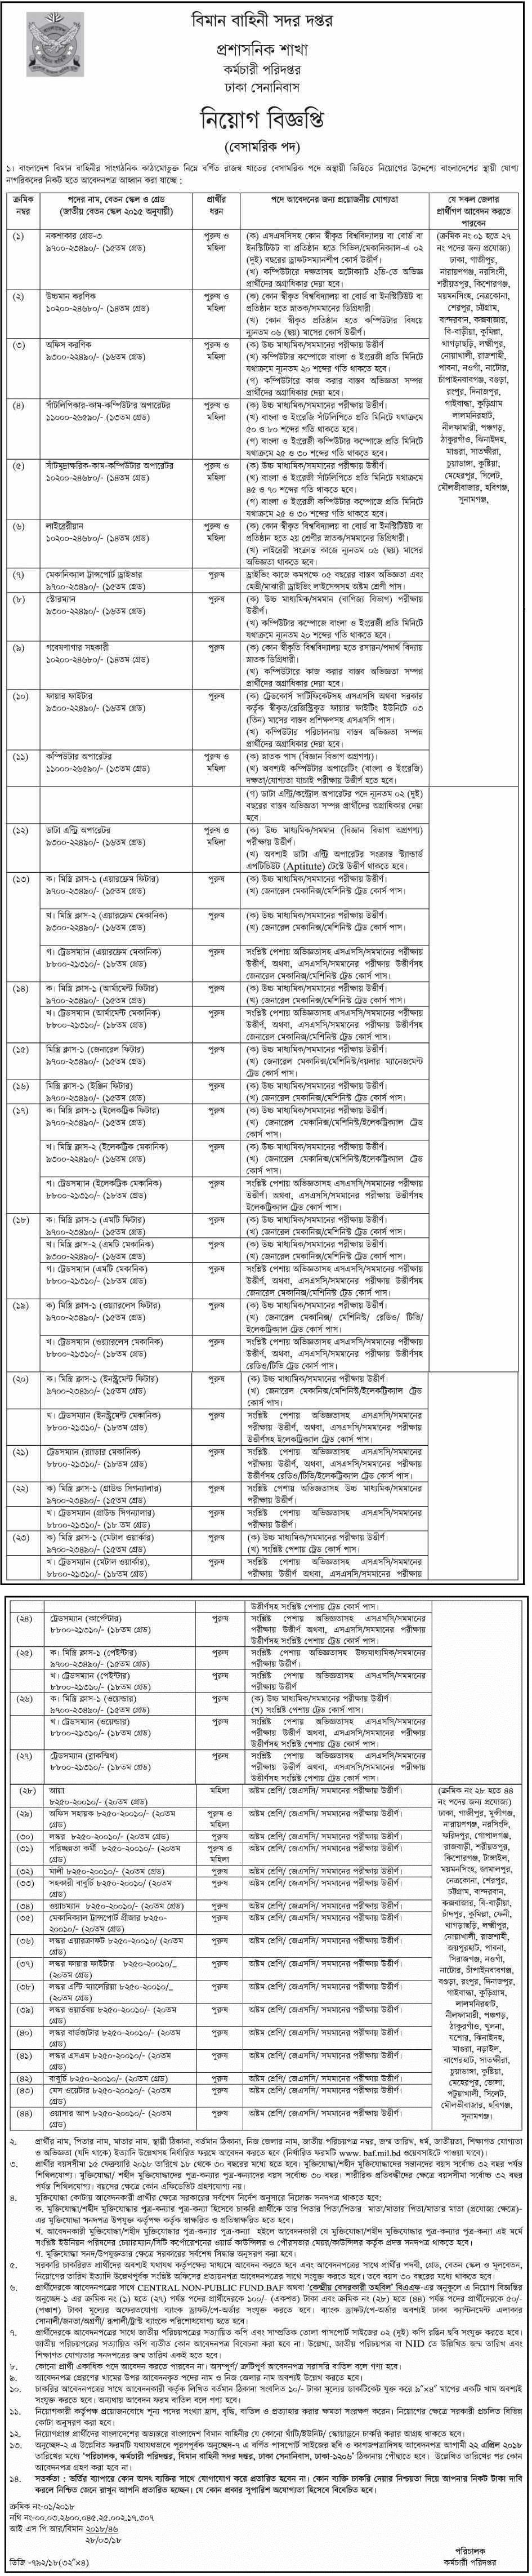 Biman Bangladesh Airlines Ltd job circular 2108